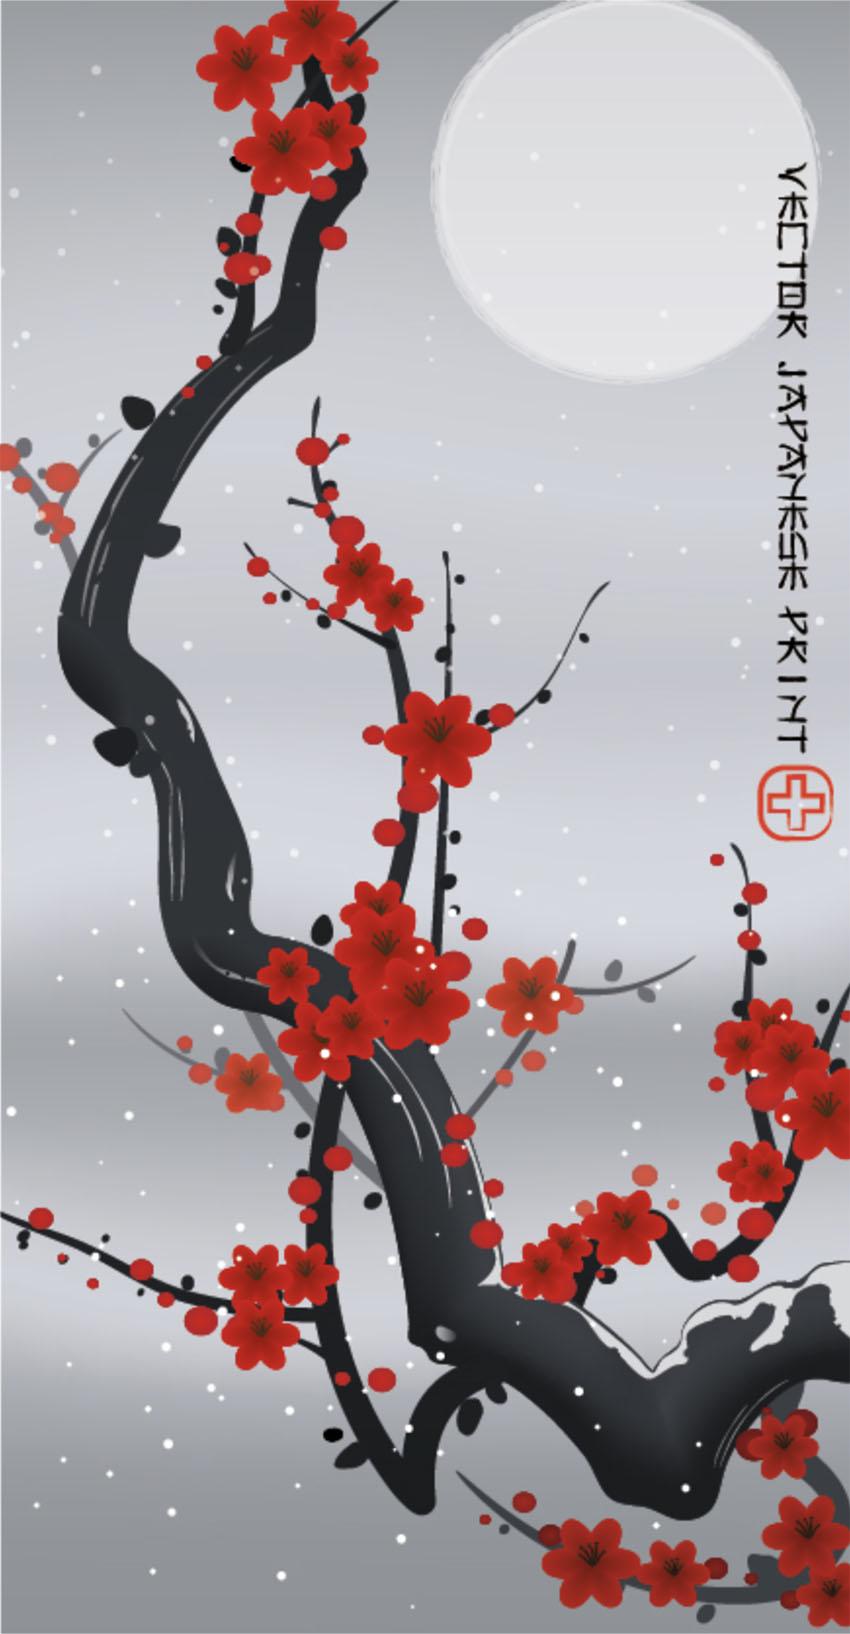 Create a Japanese Ukiyo-e Style Print